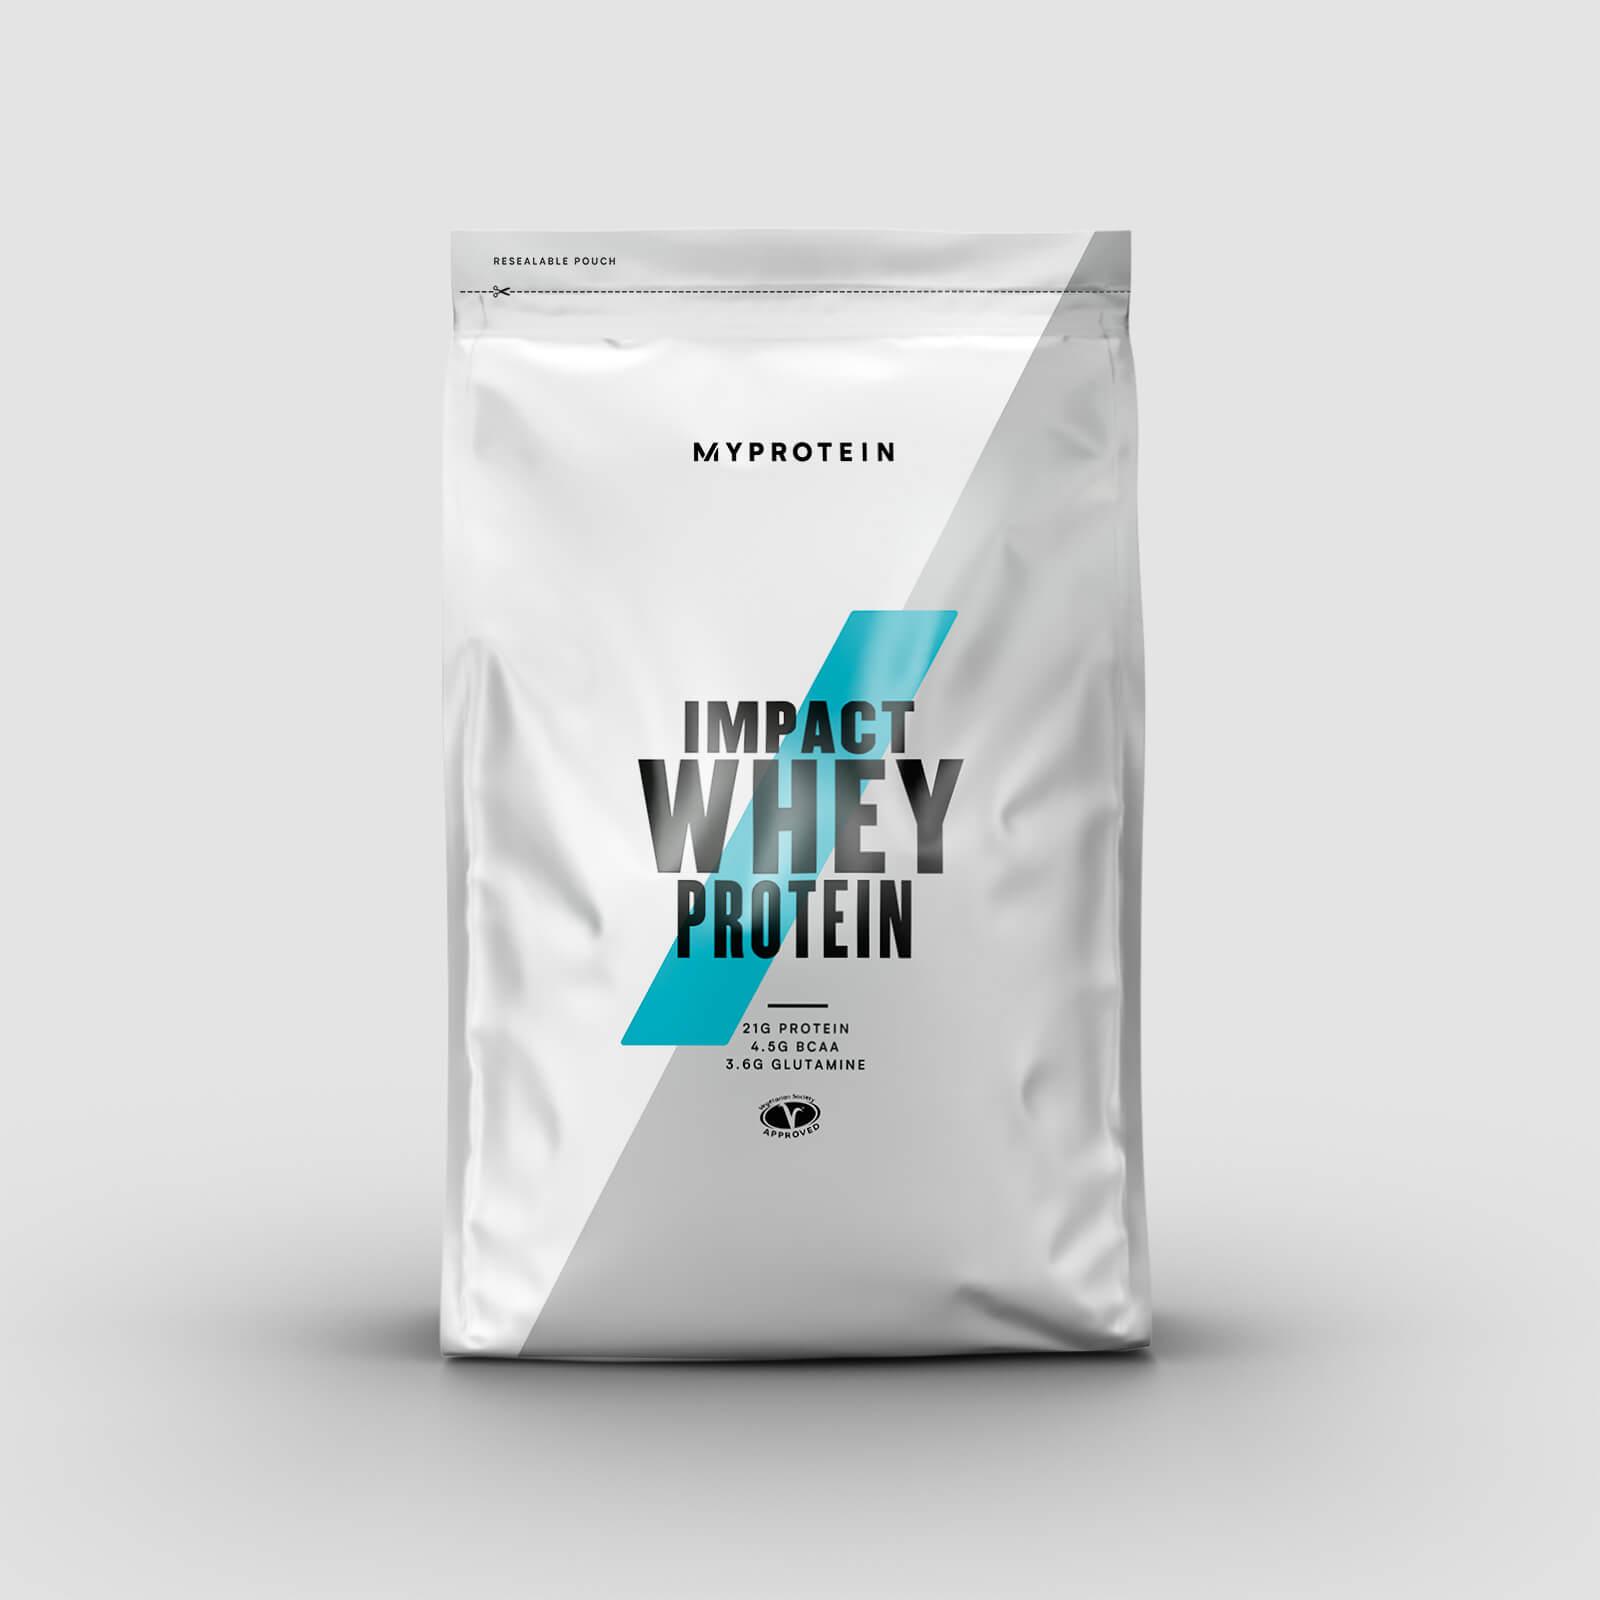 Myprotein Vassleprotein - Impact Whey Protein - 2.5kg - Cookies and Cream